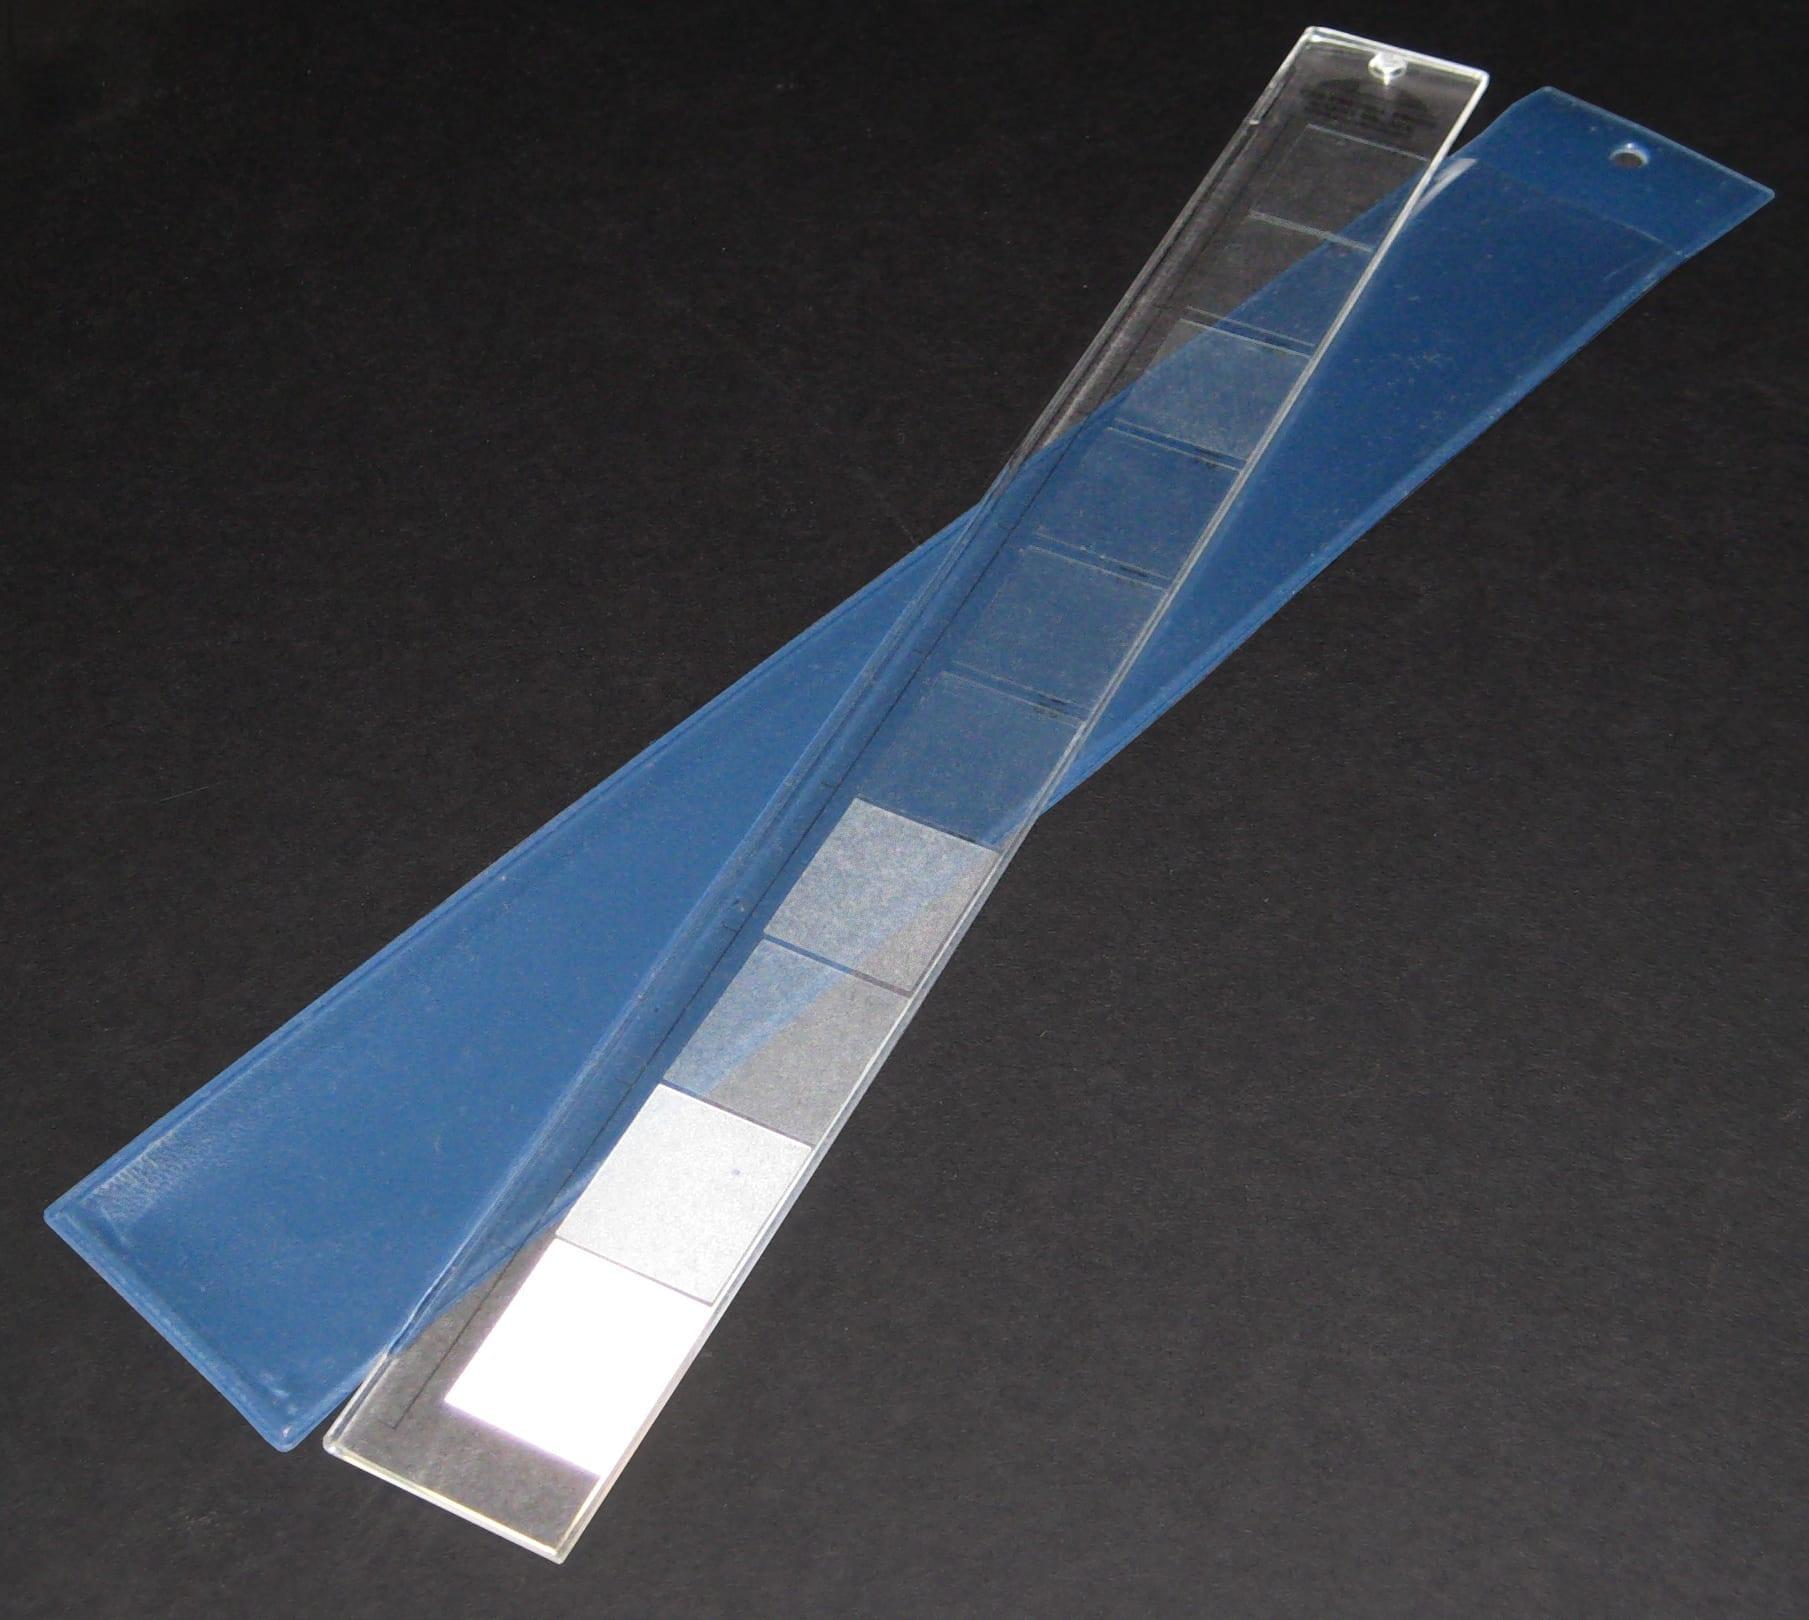 Bangerter Occlusion Foil Bar